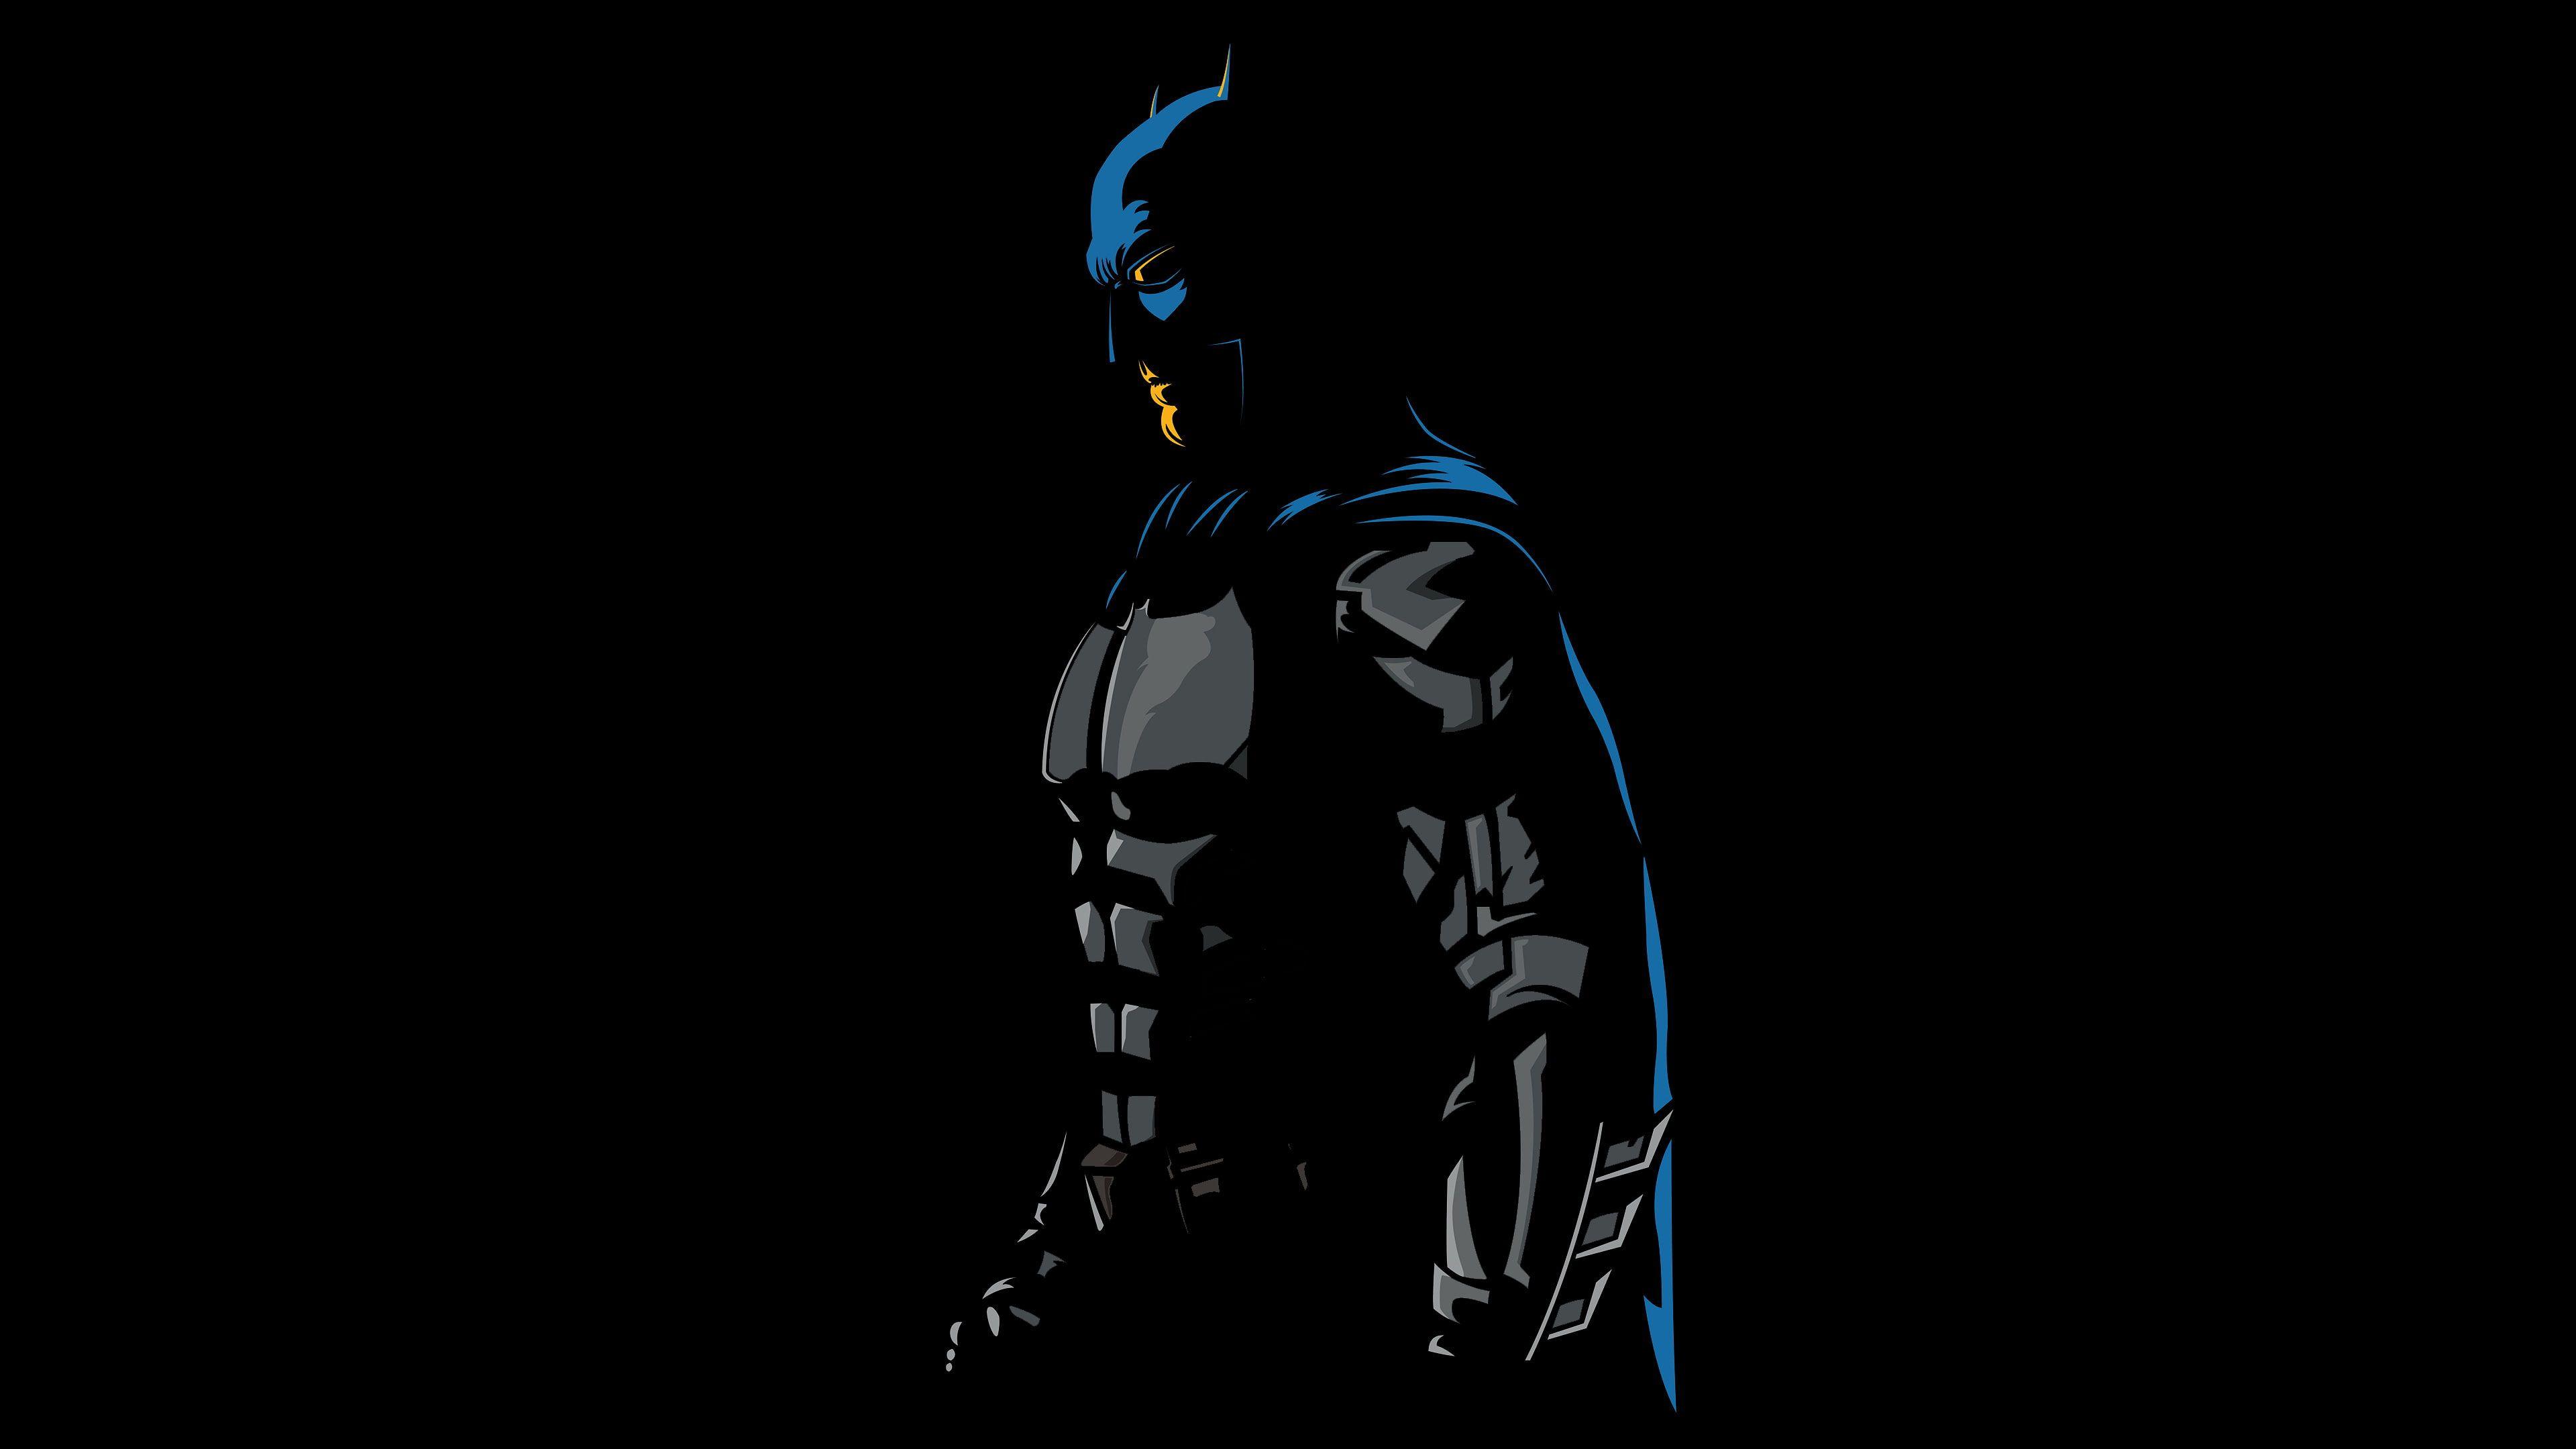 Batman Minimalism 4k Hd Artwork Artist Digital Art Superheroes Behance 4k Wallpaper Hdwallpaper Desktop Batman Wallpaper Art Wallpaper Hd Wallpaper